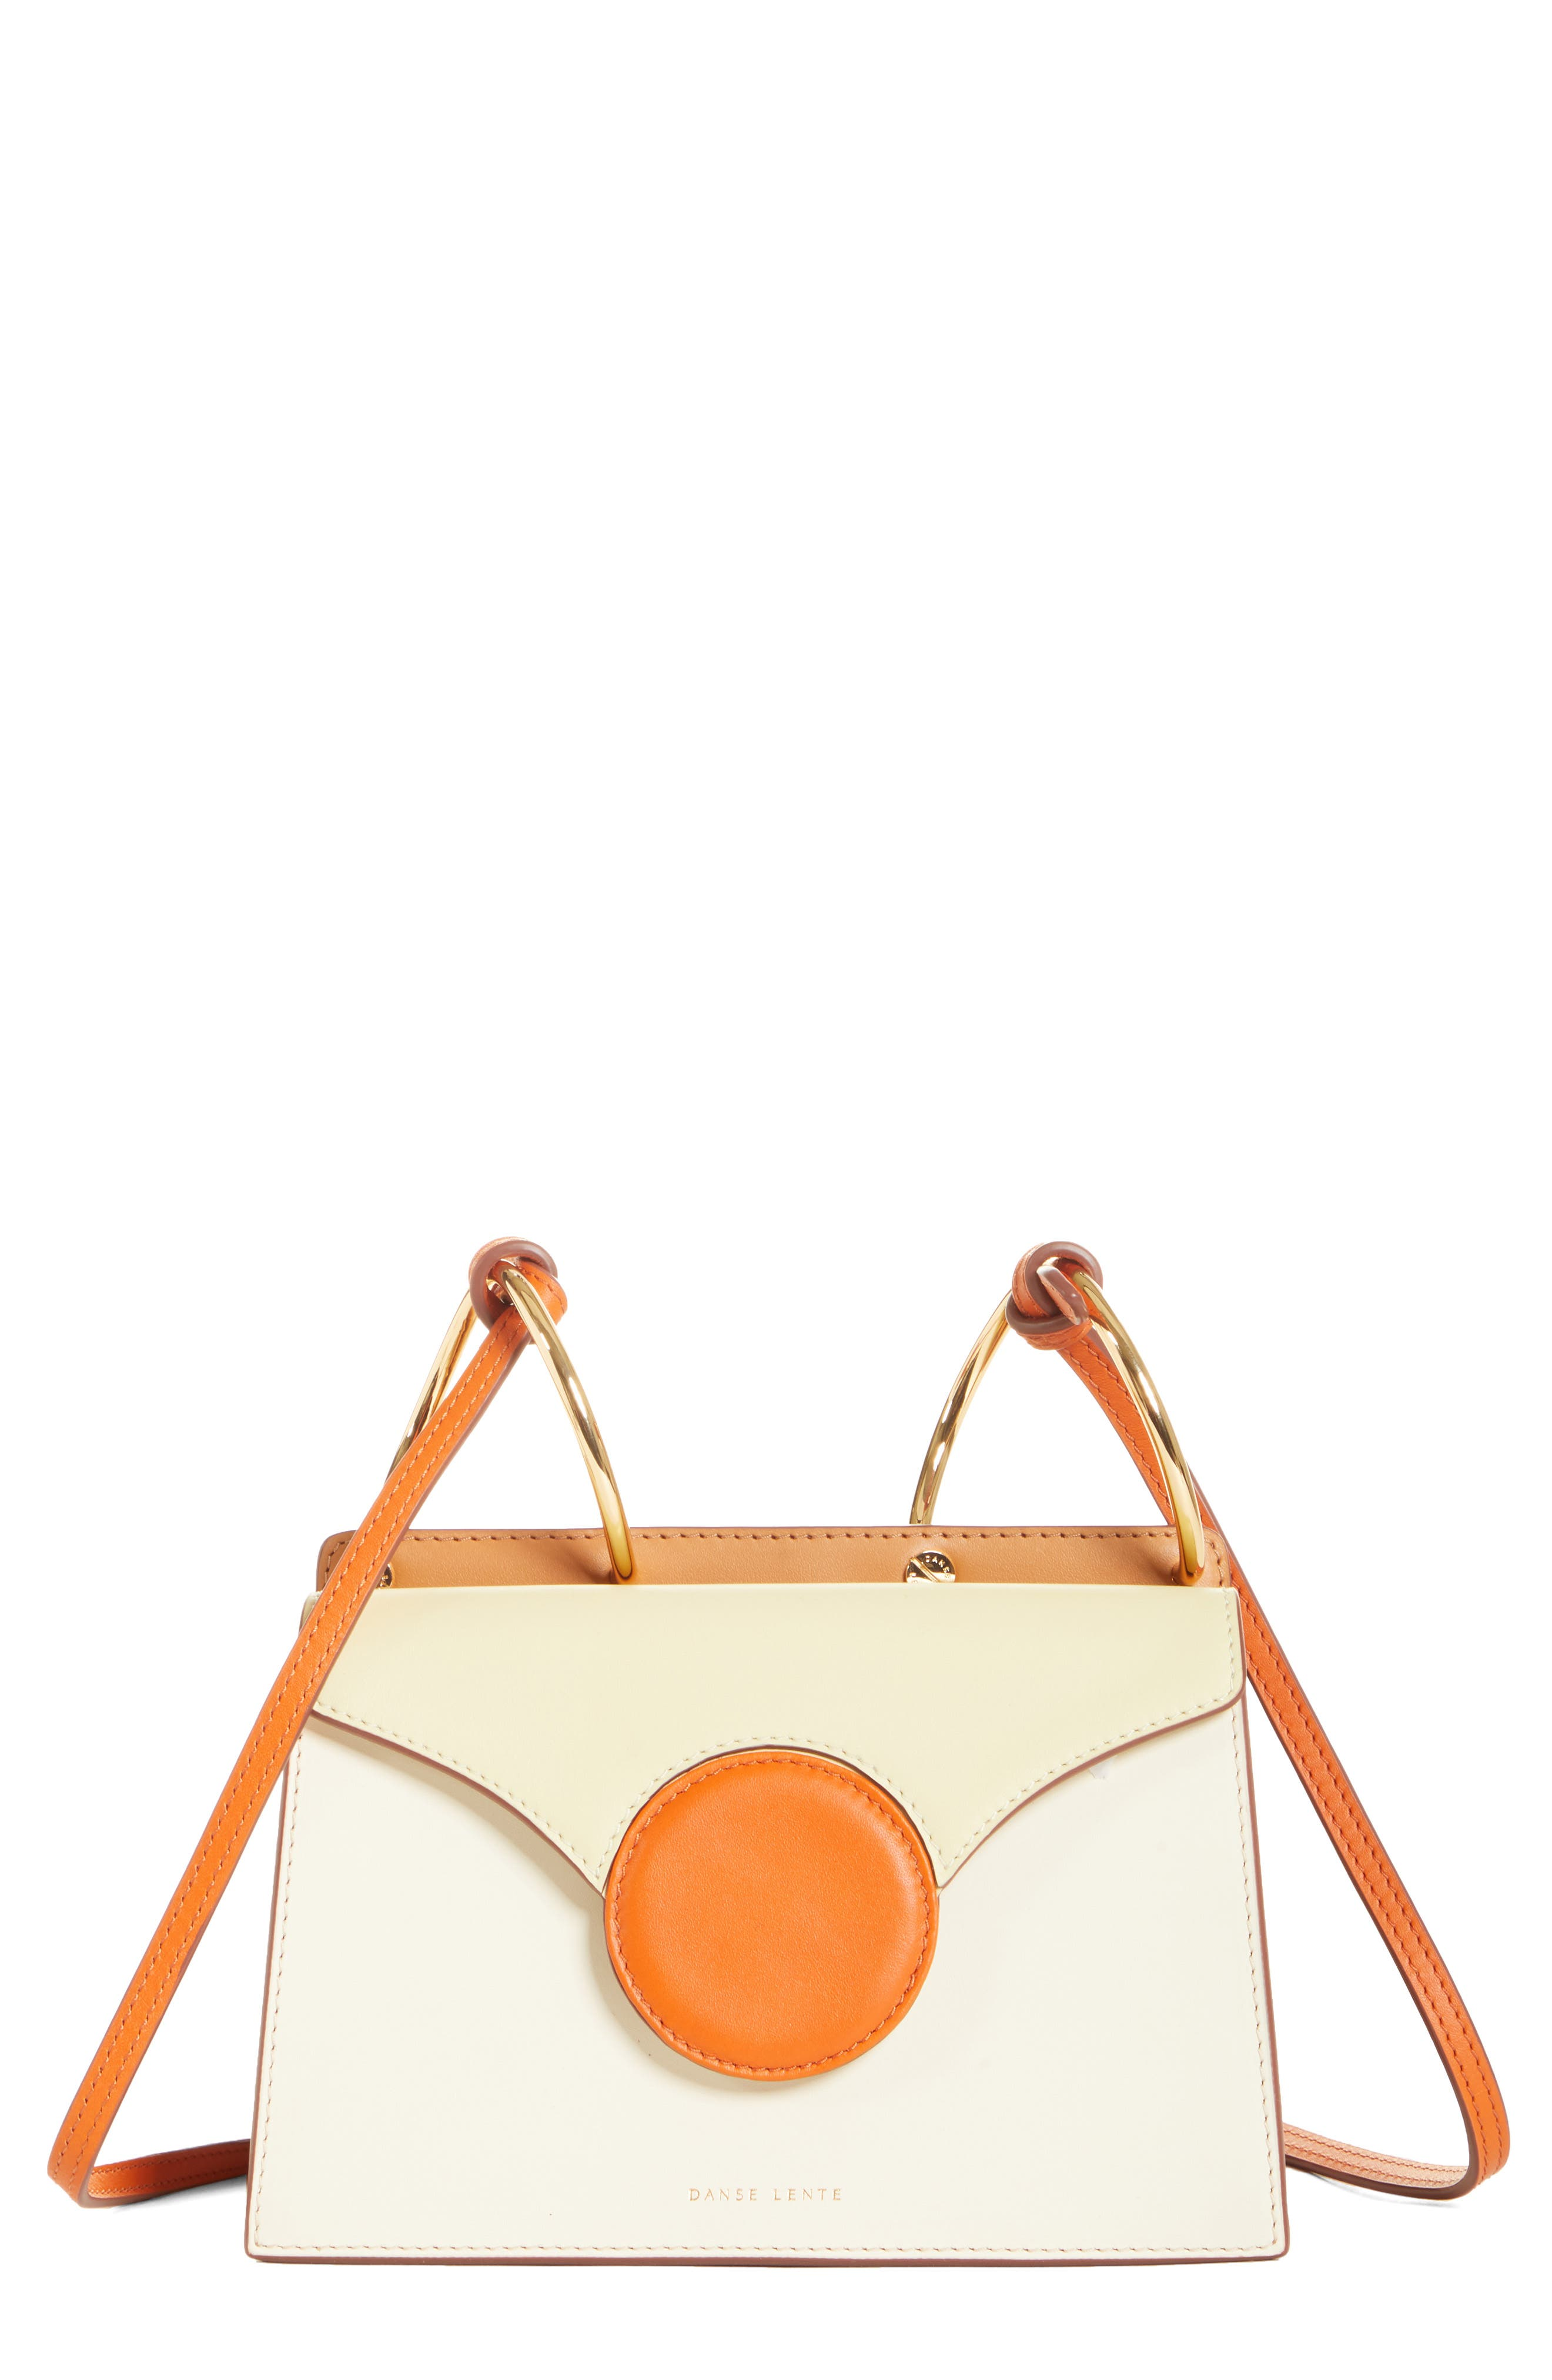 DANSE LENTE Mini Phoebe Leather Bag, Main, color, TOFFEE/ MARSHMALLOW